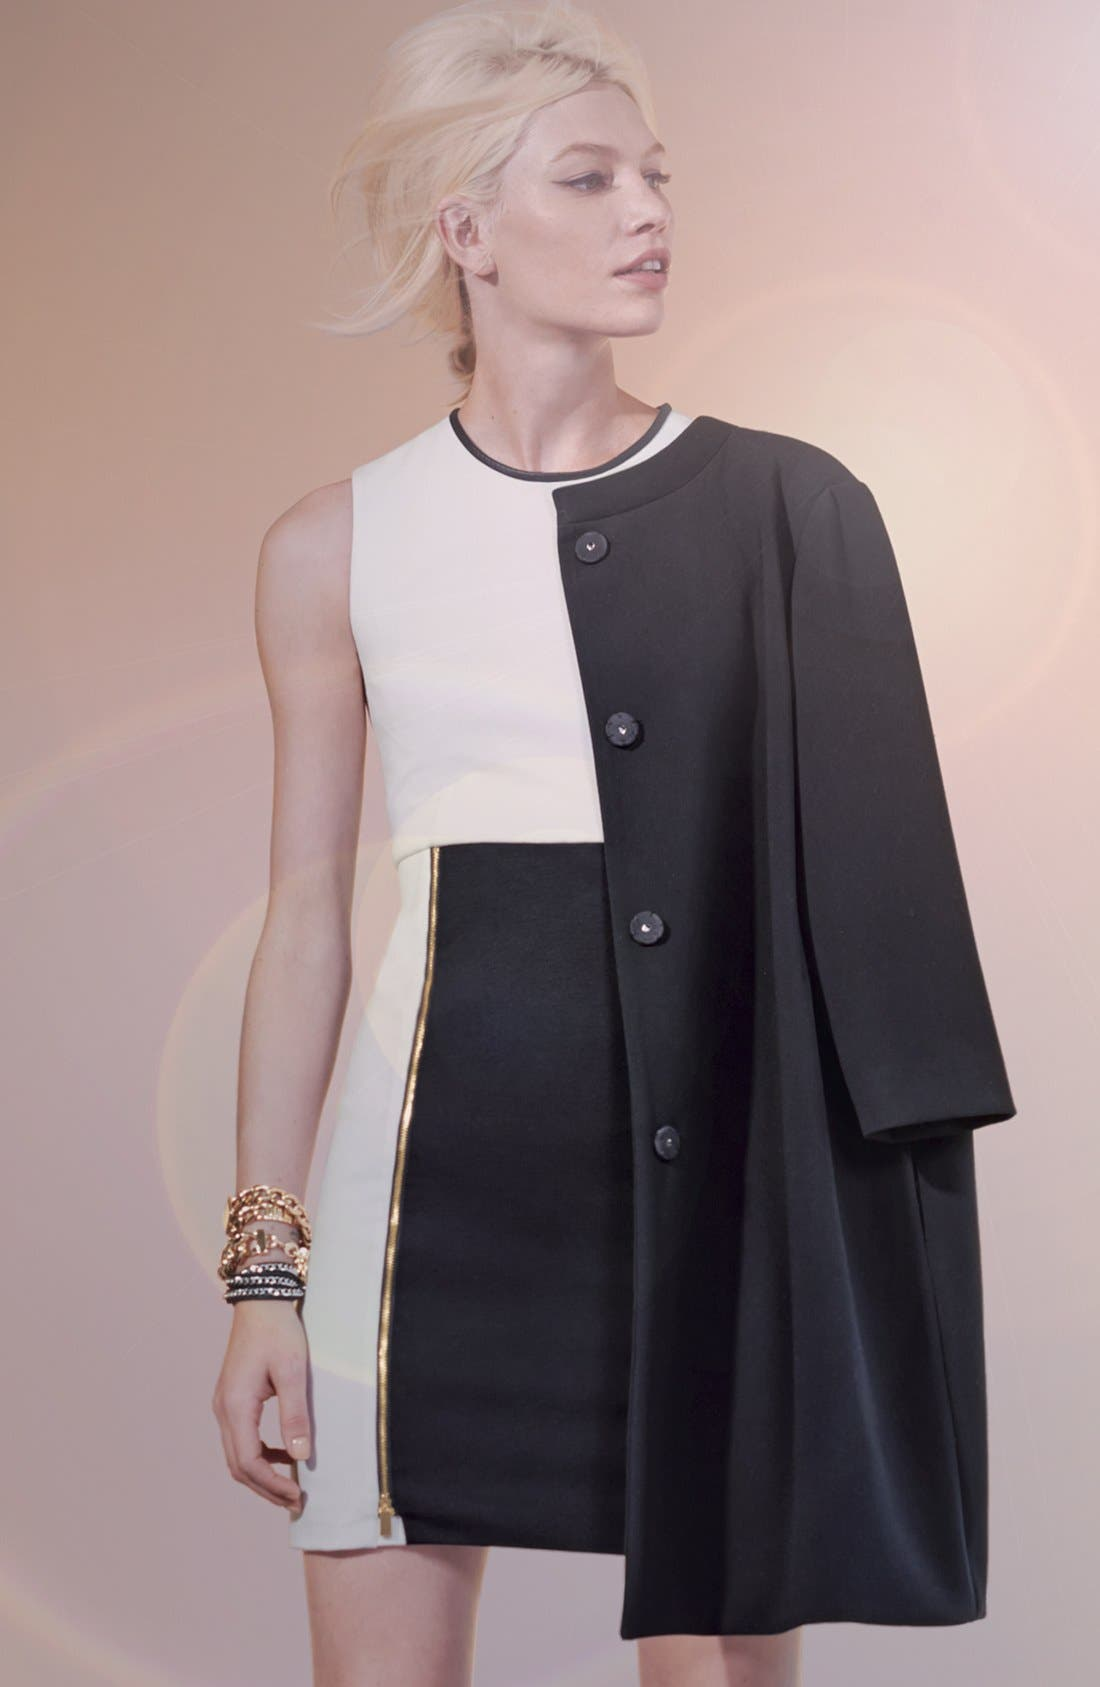 Alternate Image 1 Selected - Vince Camuto Coat & Colorblock Sheath Dress